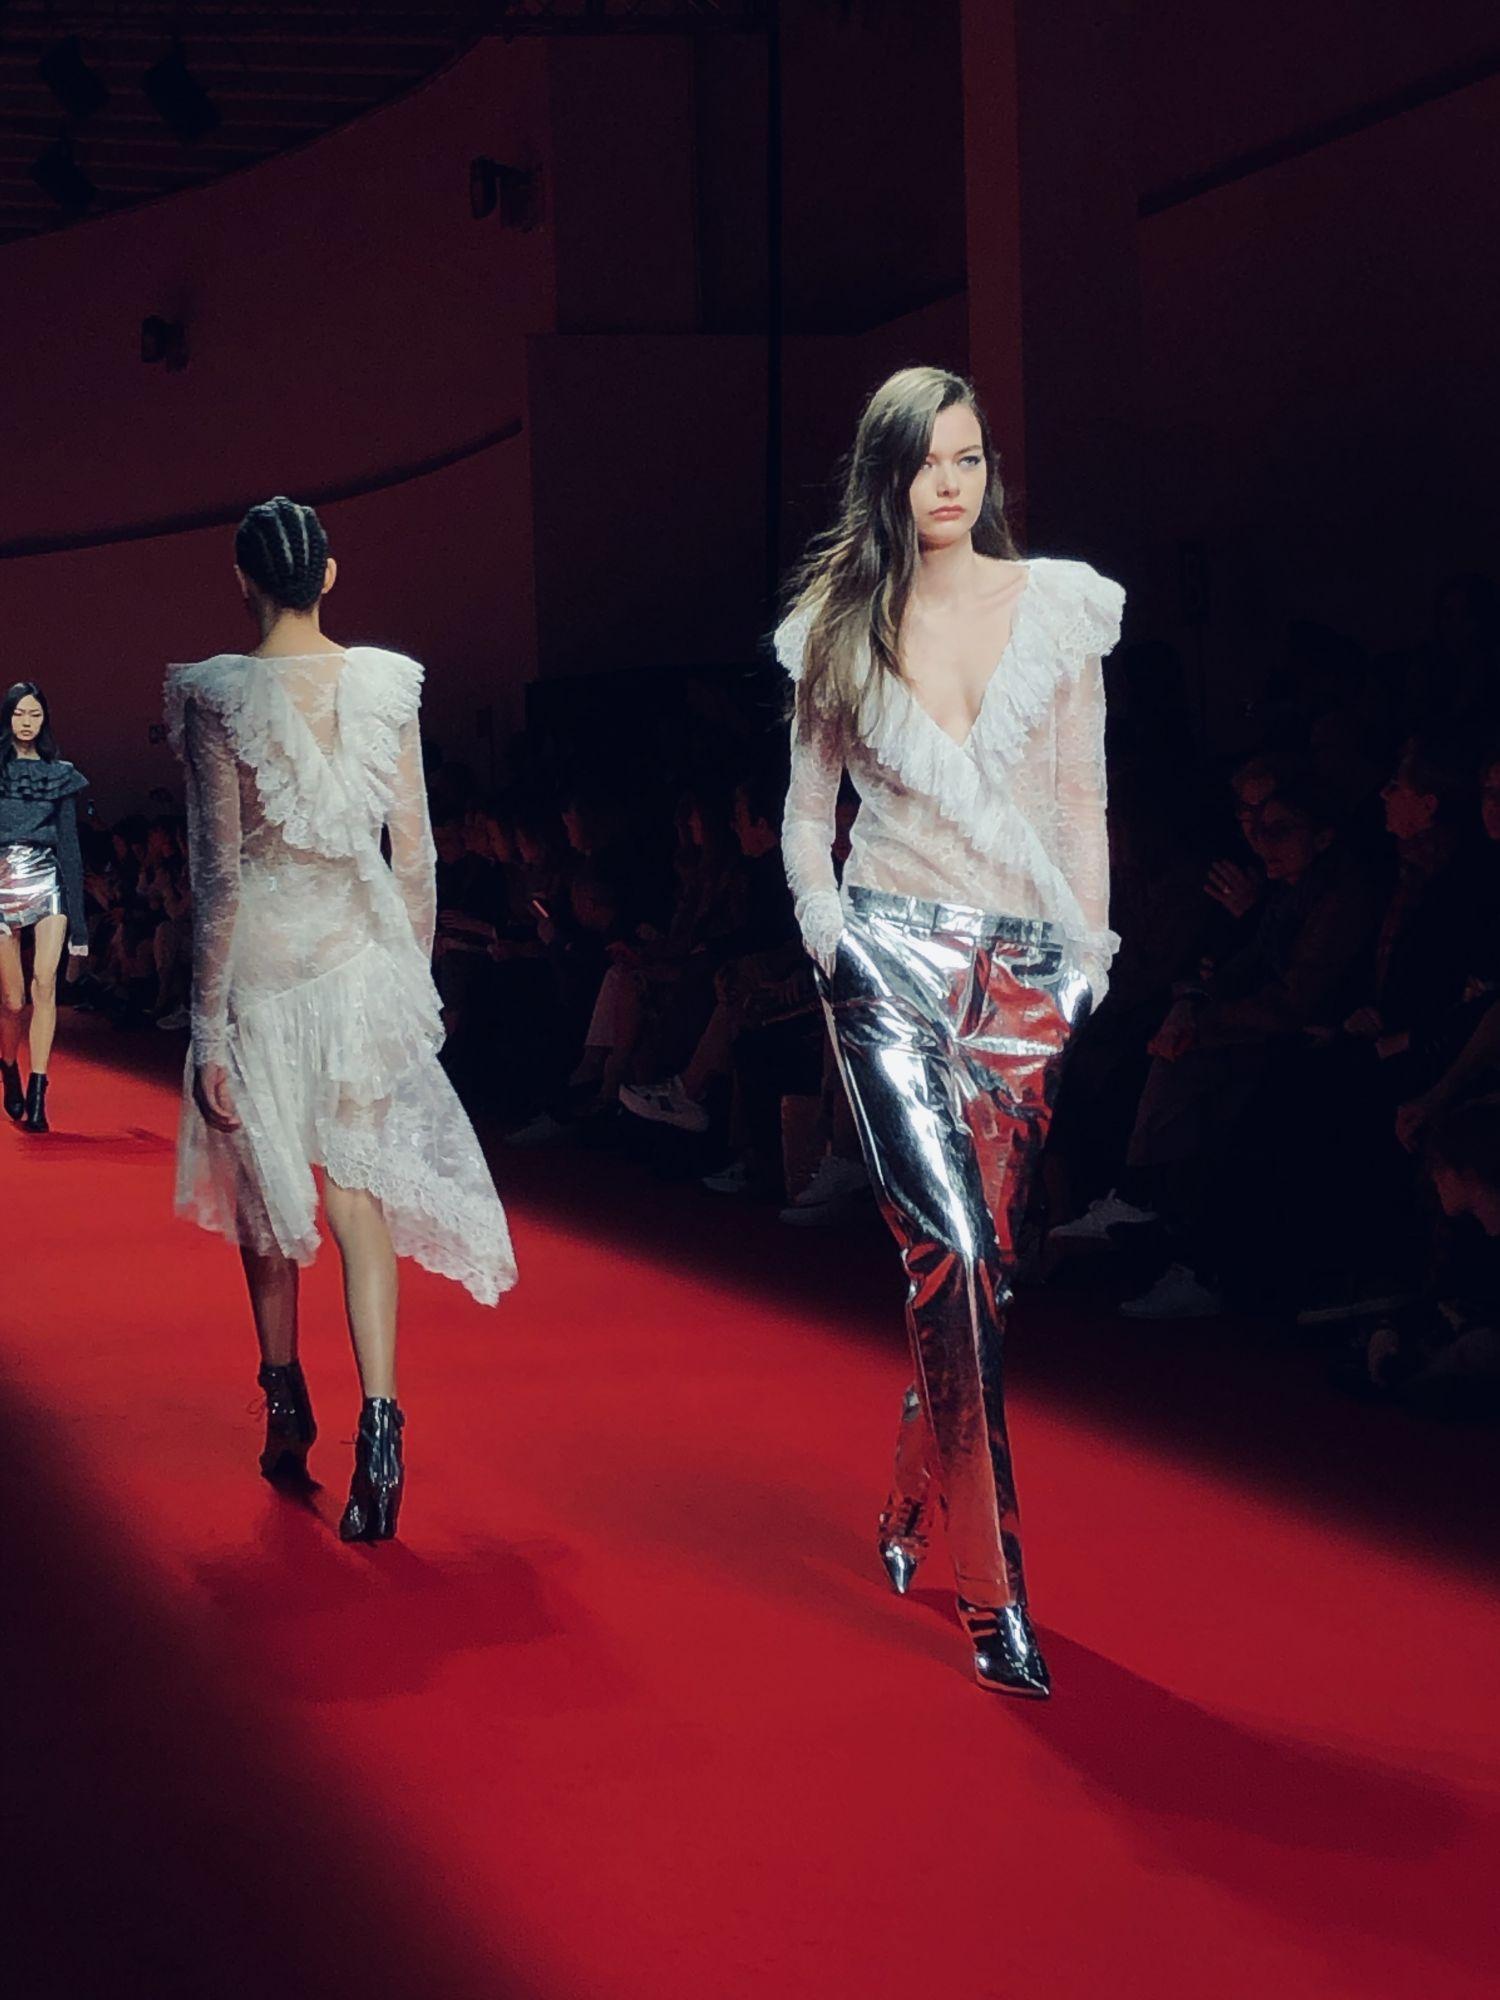 Milan Fashion Week Fall/Winter 2019: Day 4 Highlights